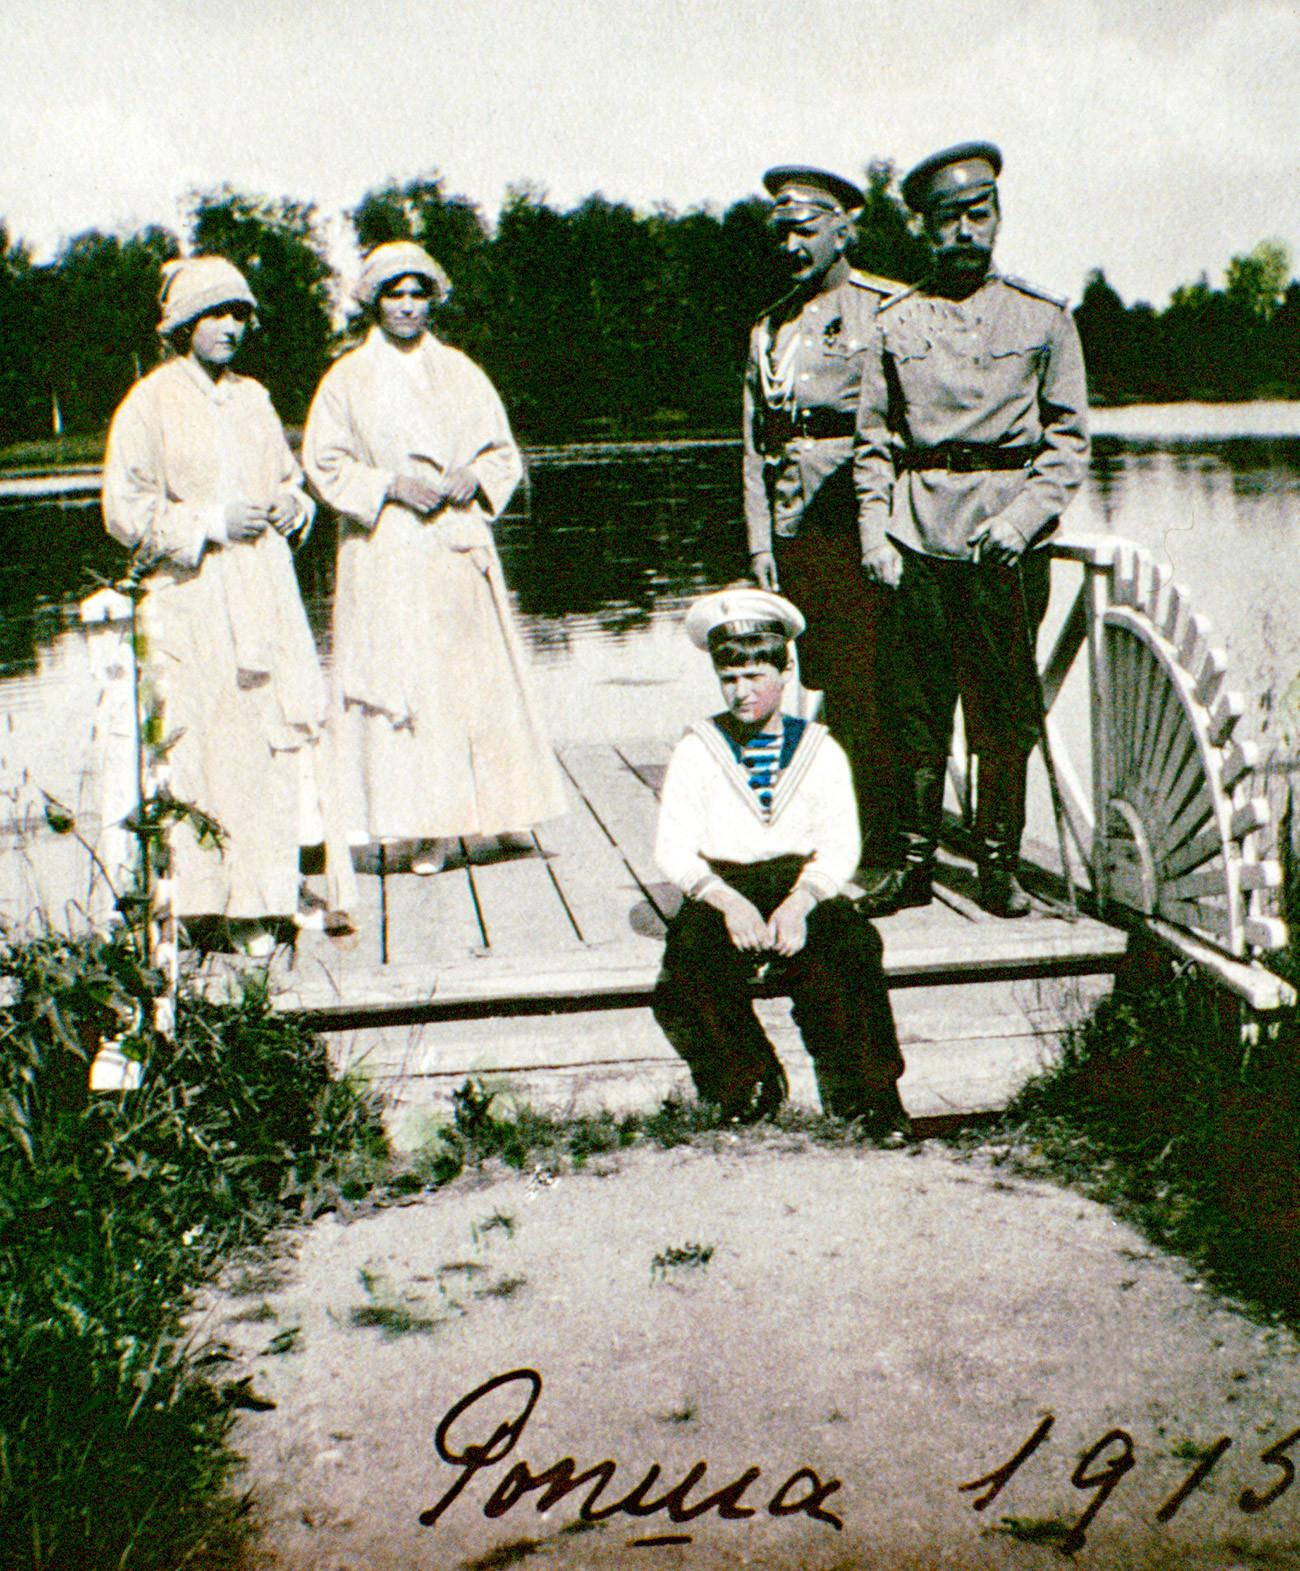 Anastasia, Maria, Alexei, Tsar Nikolay II dan Nikolai Sablin, seorang anggota AL Kekaisaran Rusia, pada 1915 di Ropsha, lokasi favorit keluarga kerajaan untuk berburu dan memancing, 20 km di selatan Peterhof.